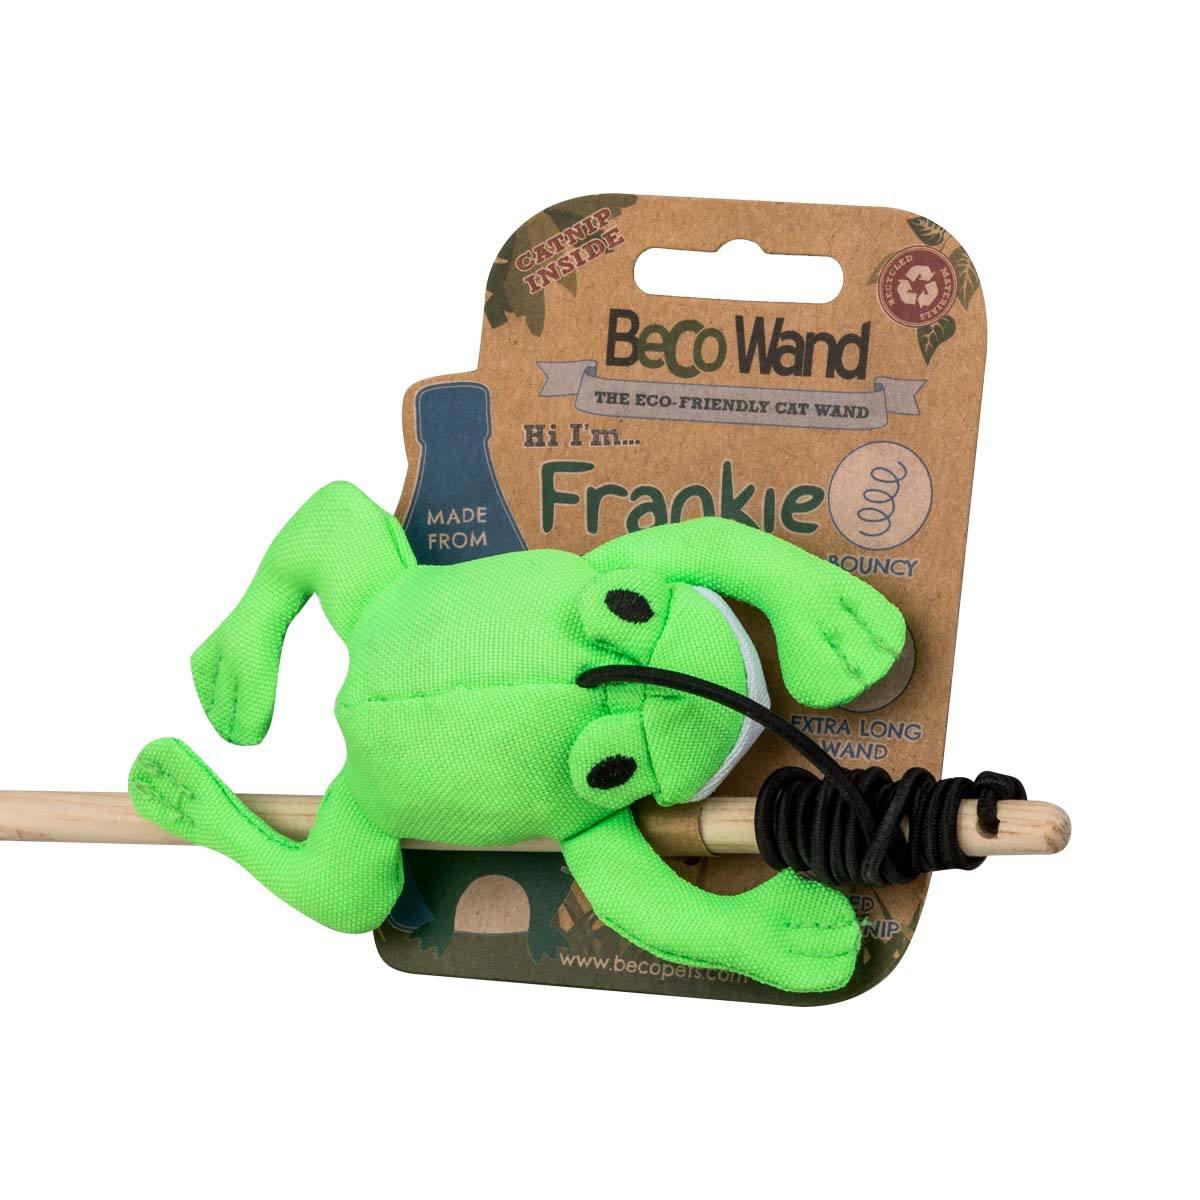 Beco Catnip Wand Cat Toy Toys